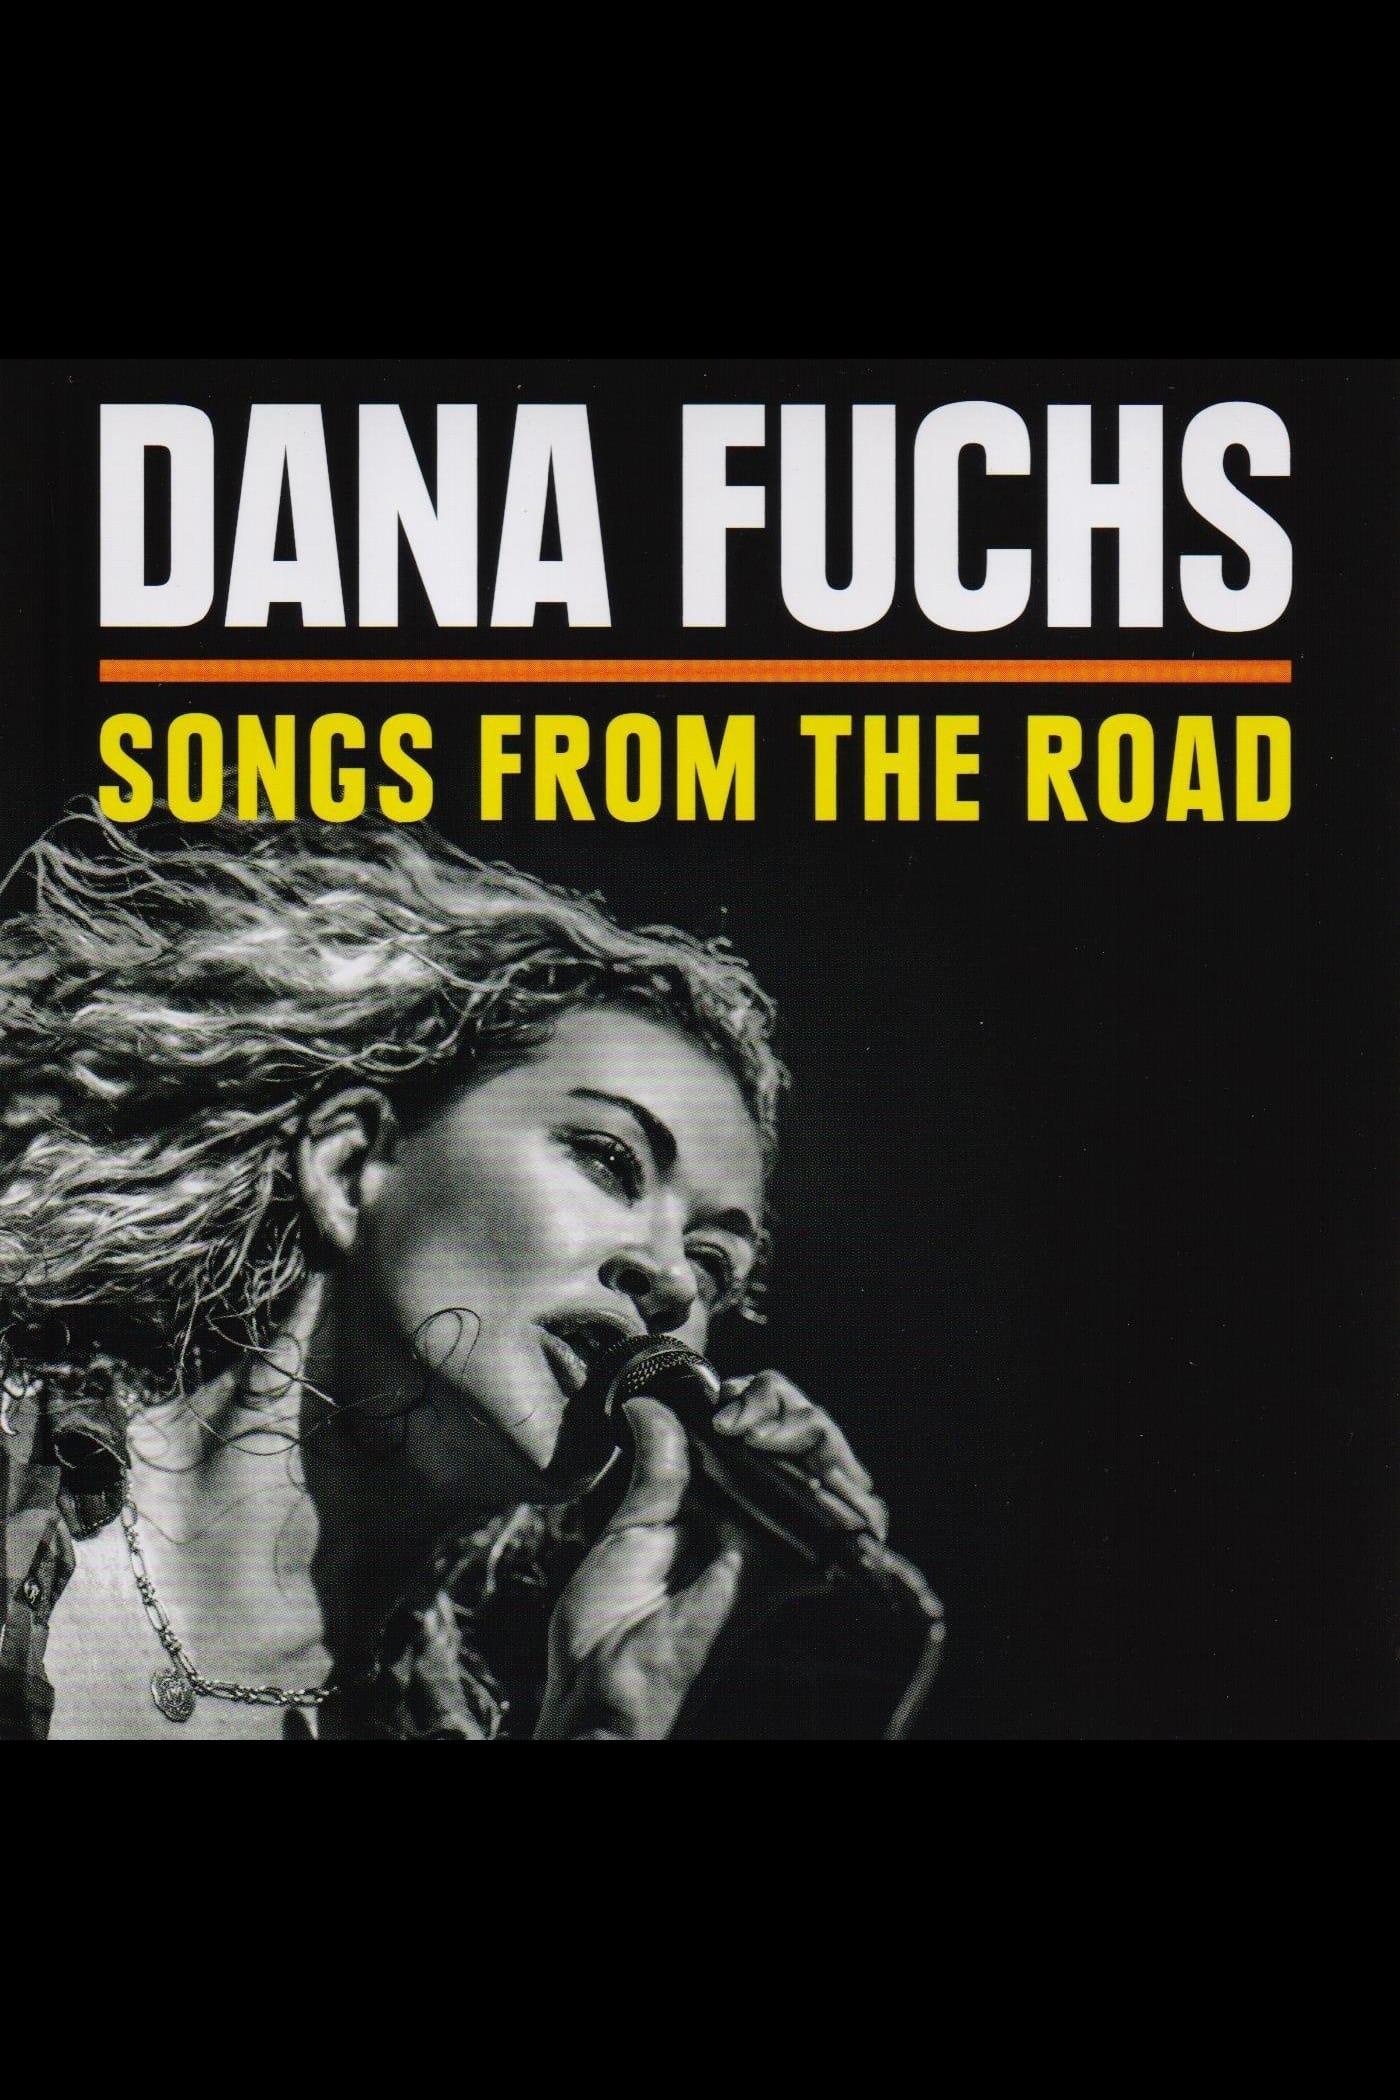 Dana Fuchs - Songs From The Road (2014)